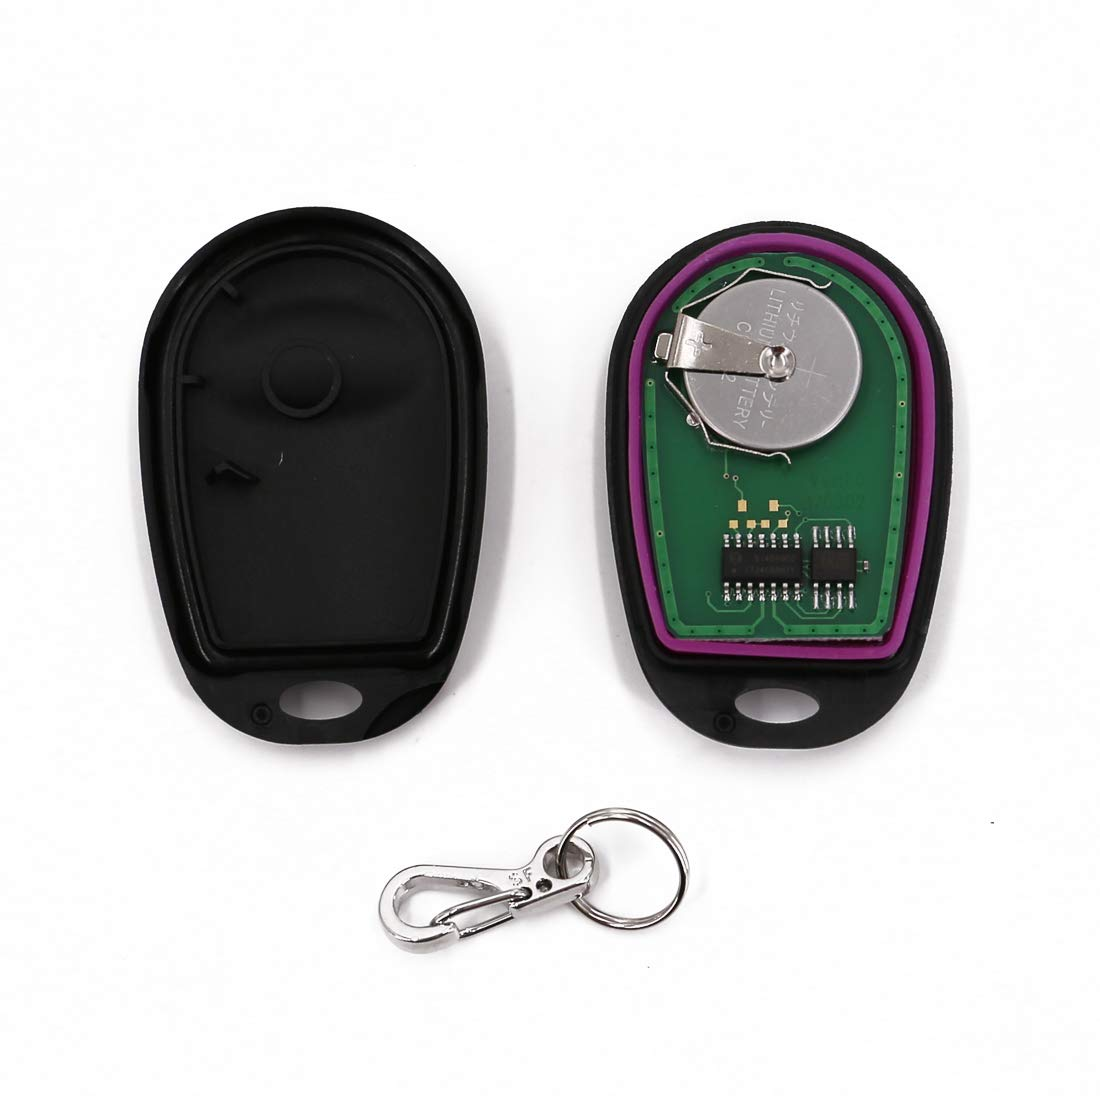 UTSAUTO Key Fob Keyless Entry Remote Replacement Keyless Entry Fits Toyota Tacoma Tundra Sienna Sequoia Highlander GQ43VT20T 3 Btn